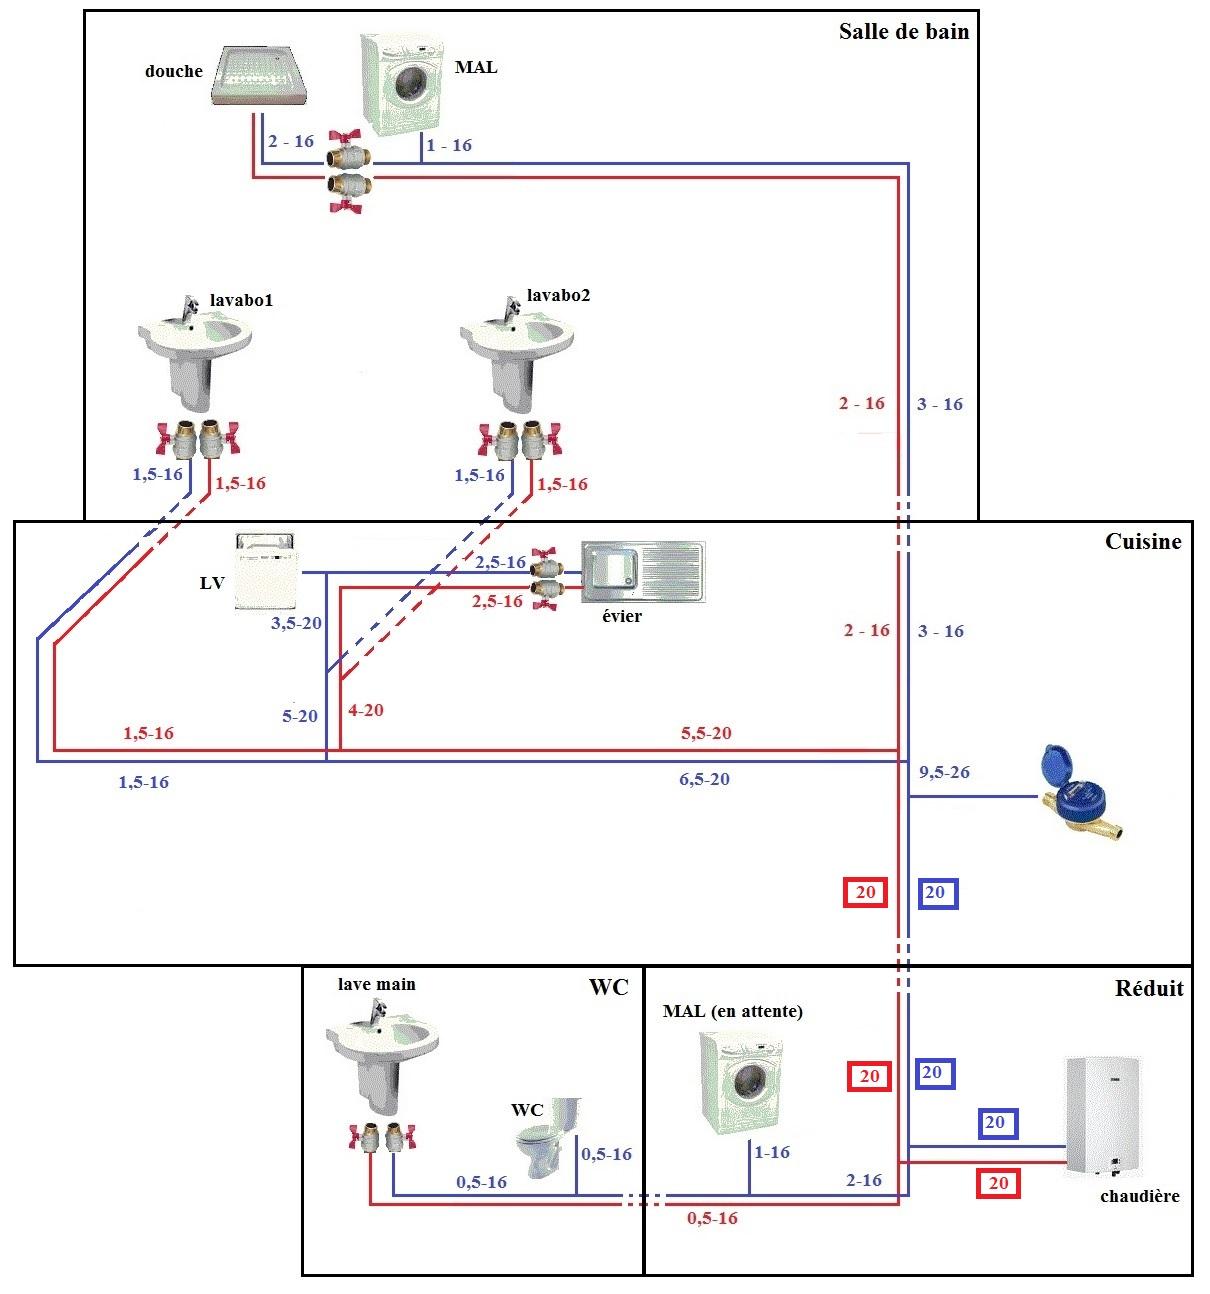 plan_sanitaire4.jpg, 200.11 kb, 1210 x 1294